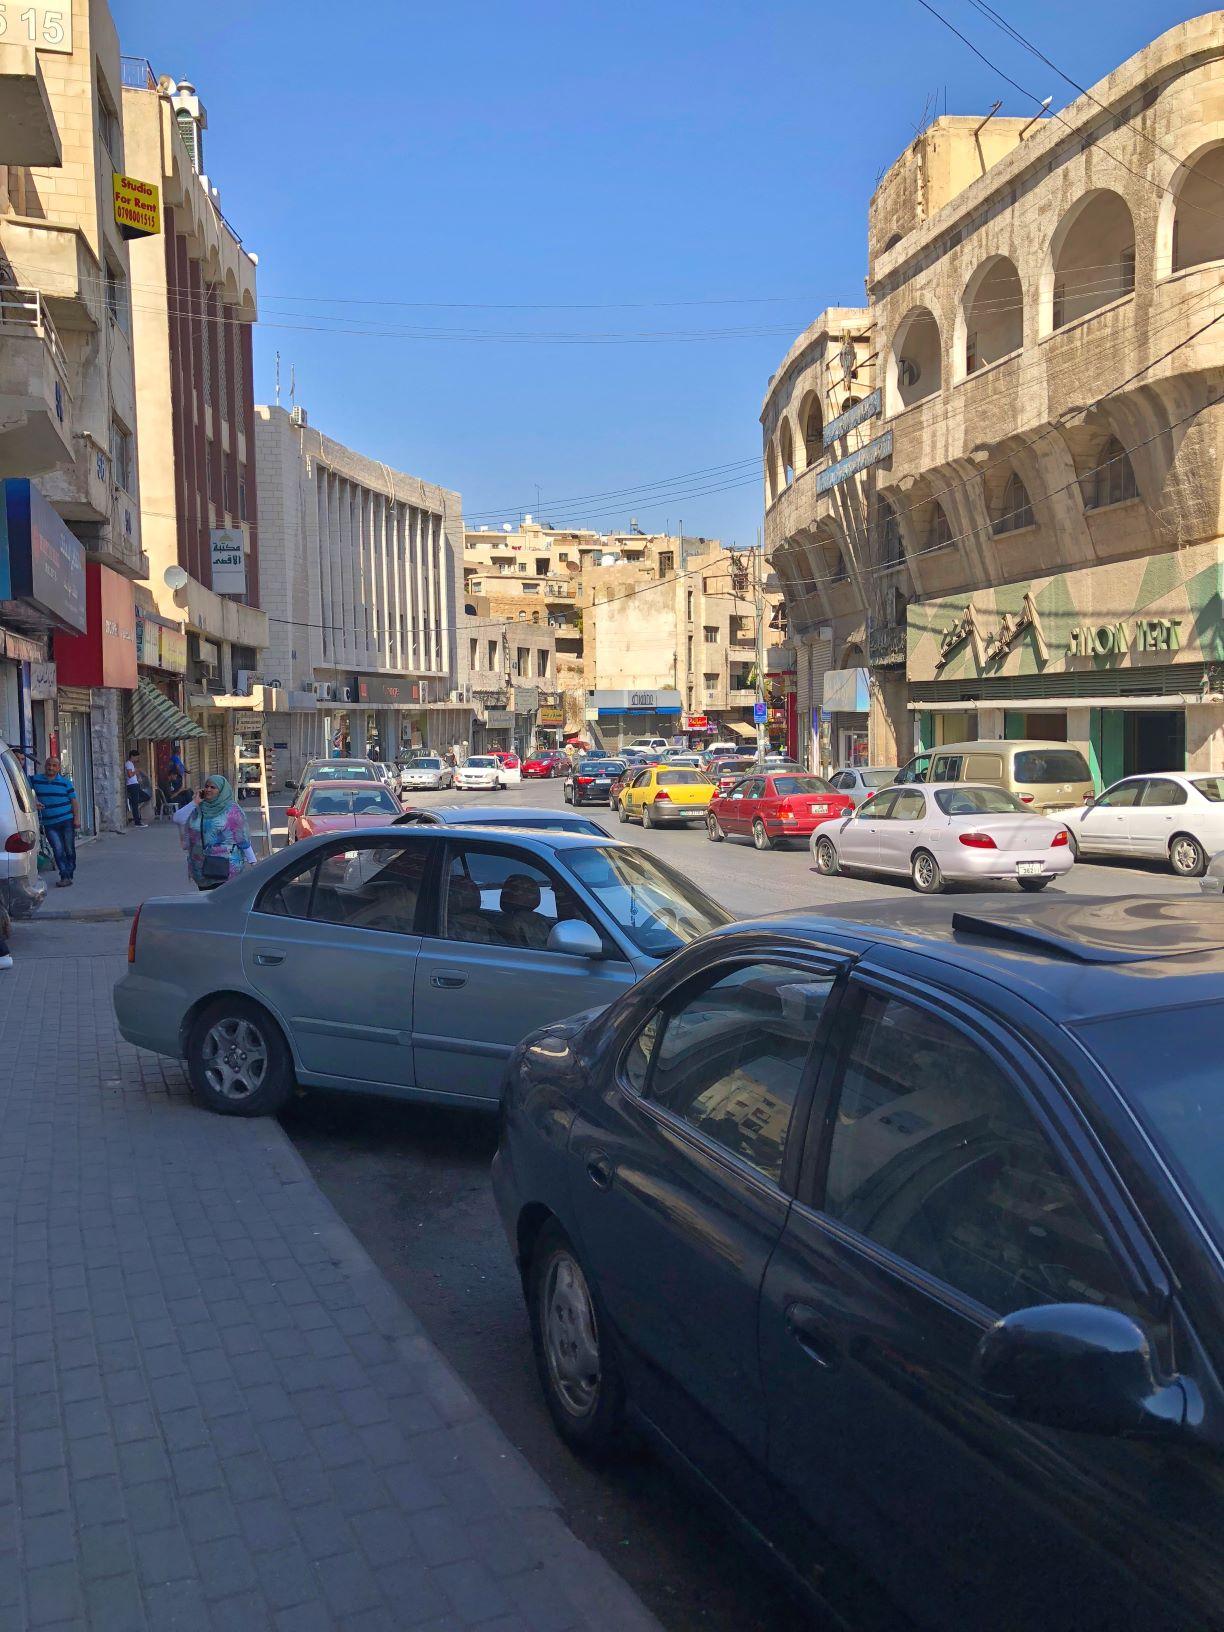 Parking in Amman